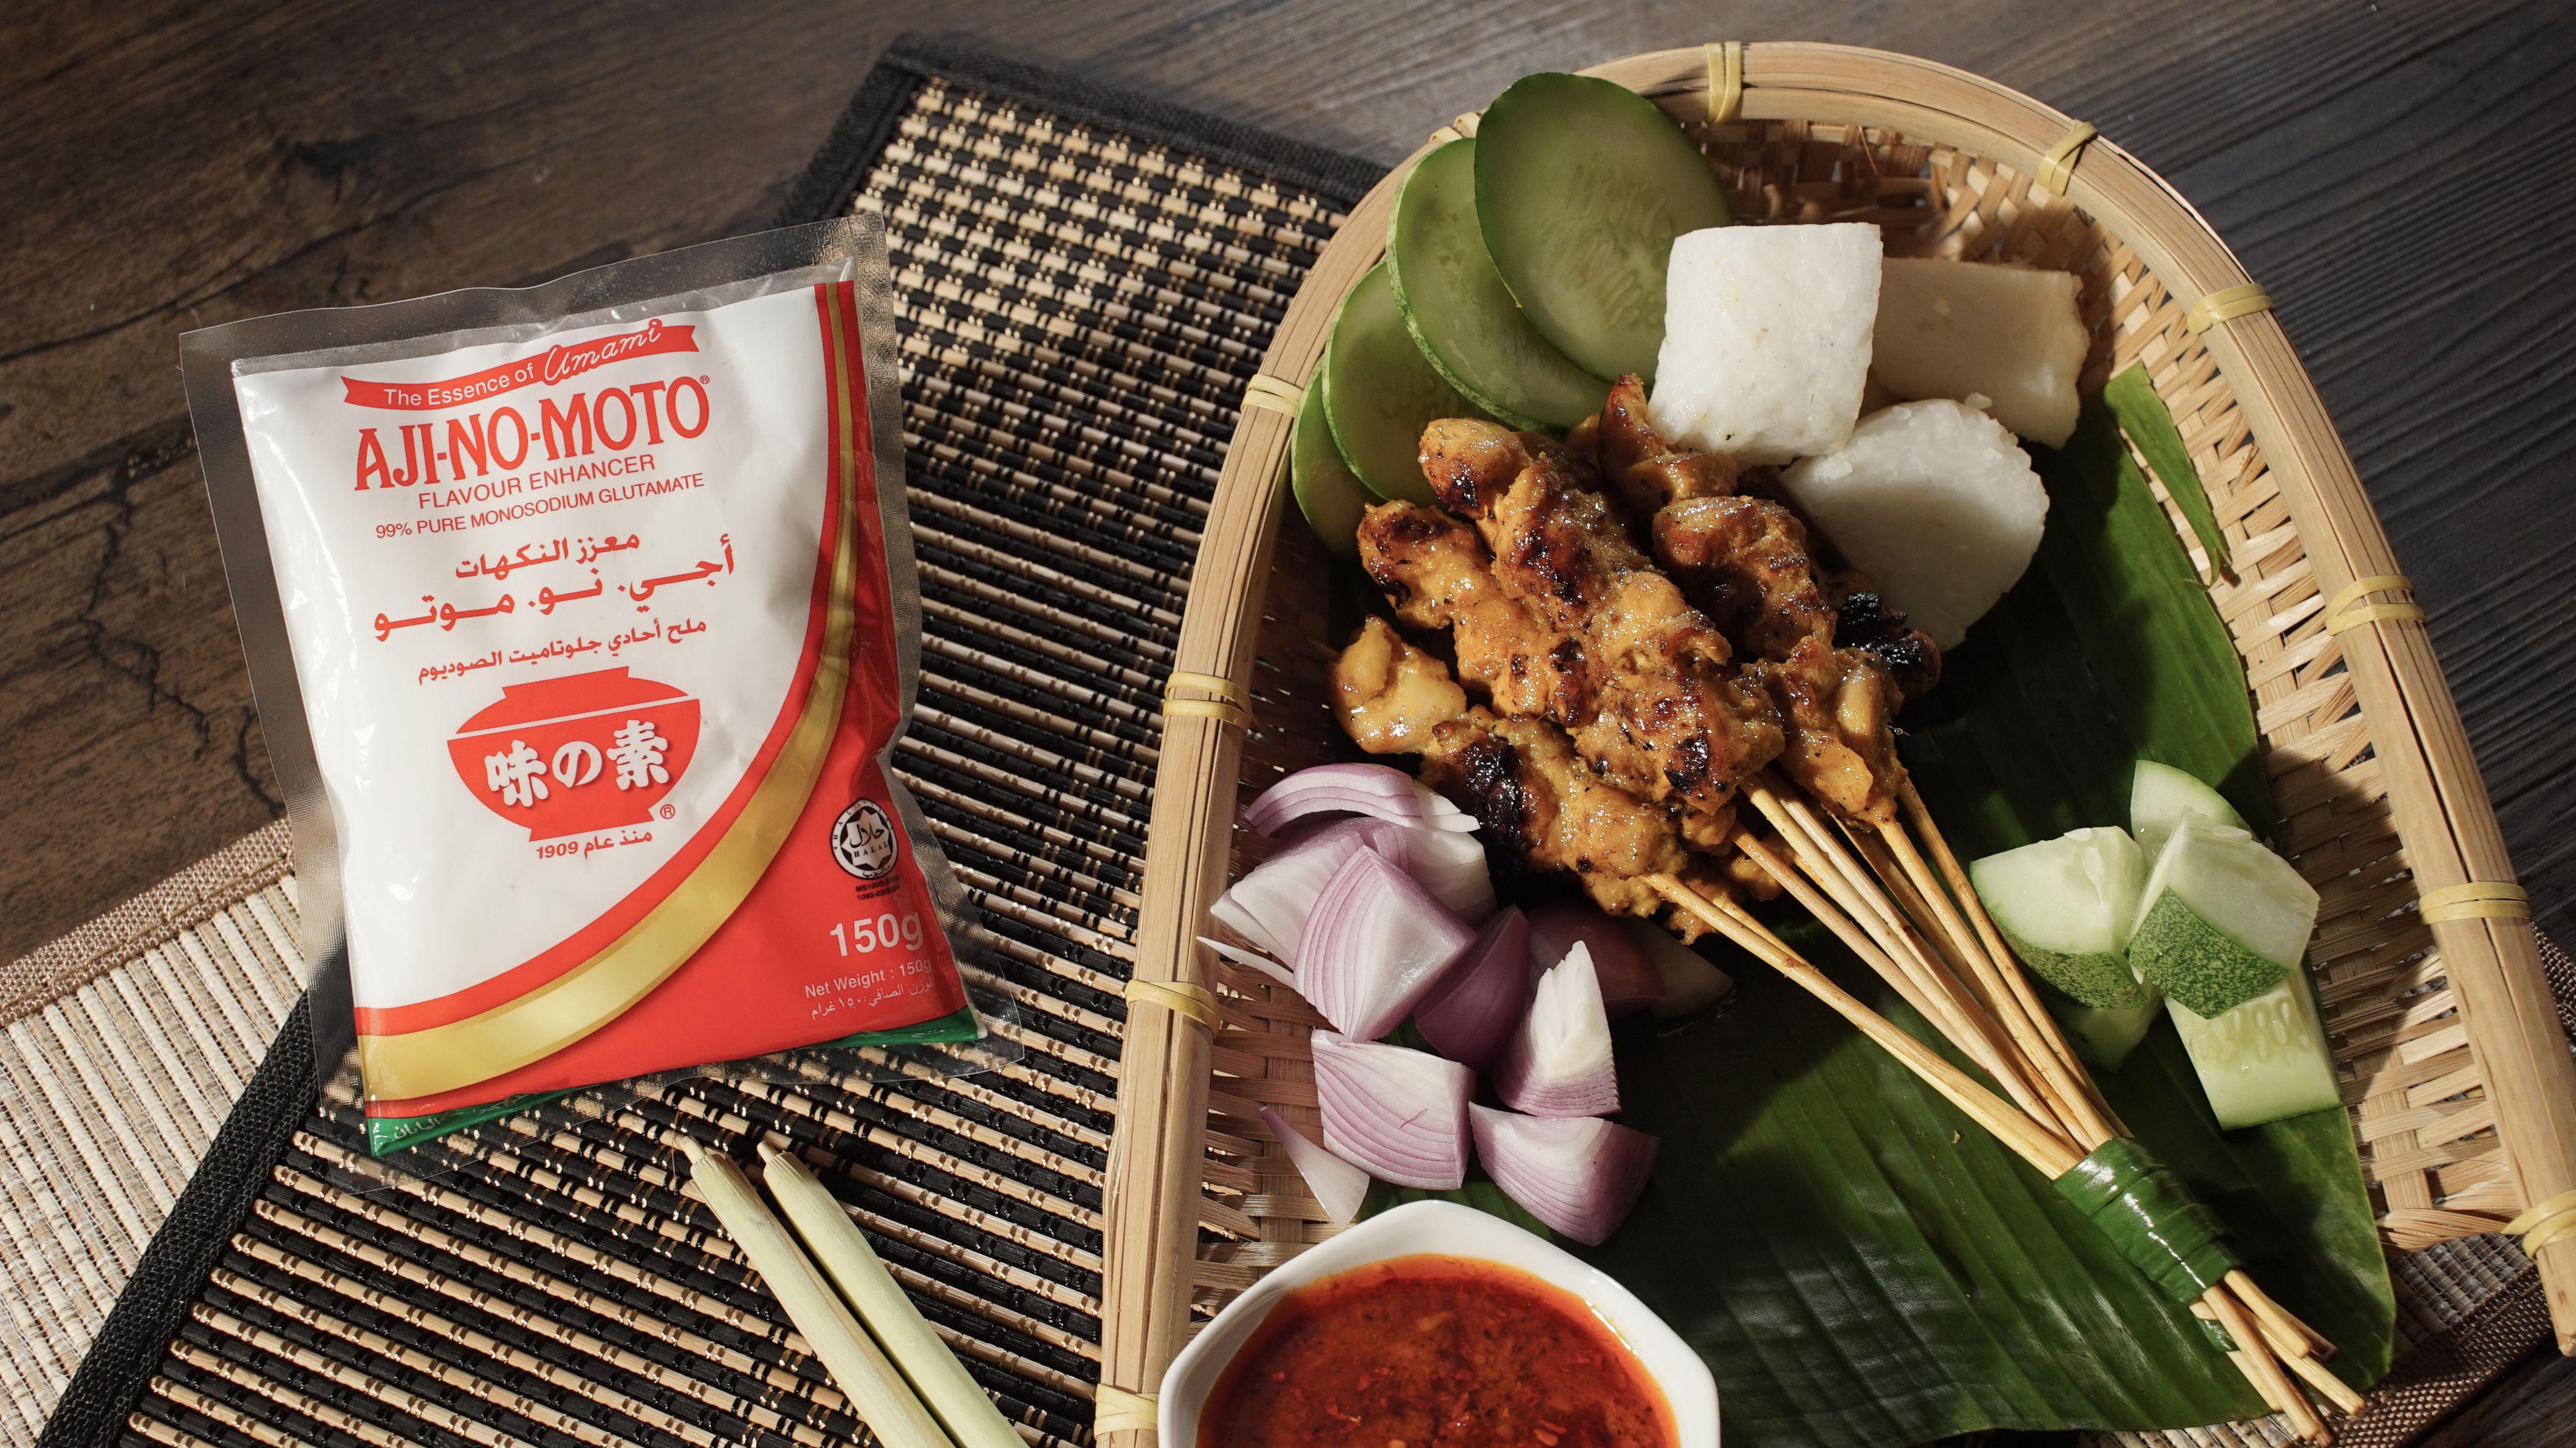 Umami Chicken Satay Umami Recipes Umami Chicken Satay About Us Ajinomoto Group Global Website Eat Well Live Well Recipe Food Processor Recipes Chicken Satay Satay